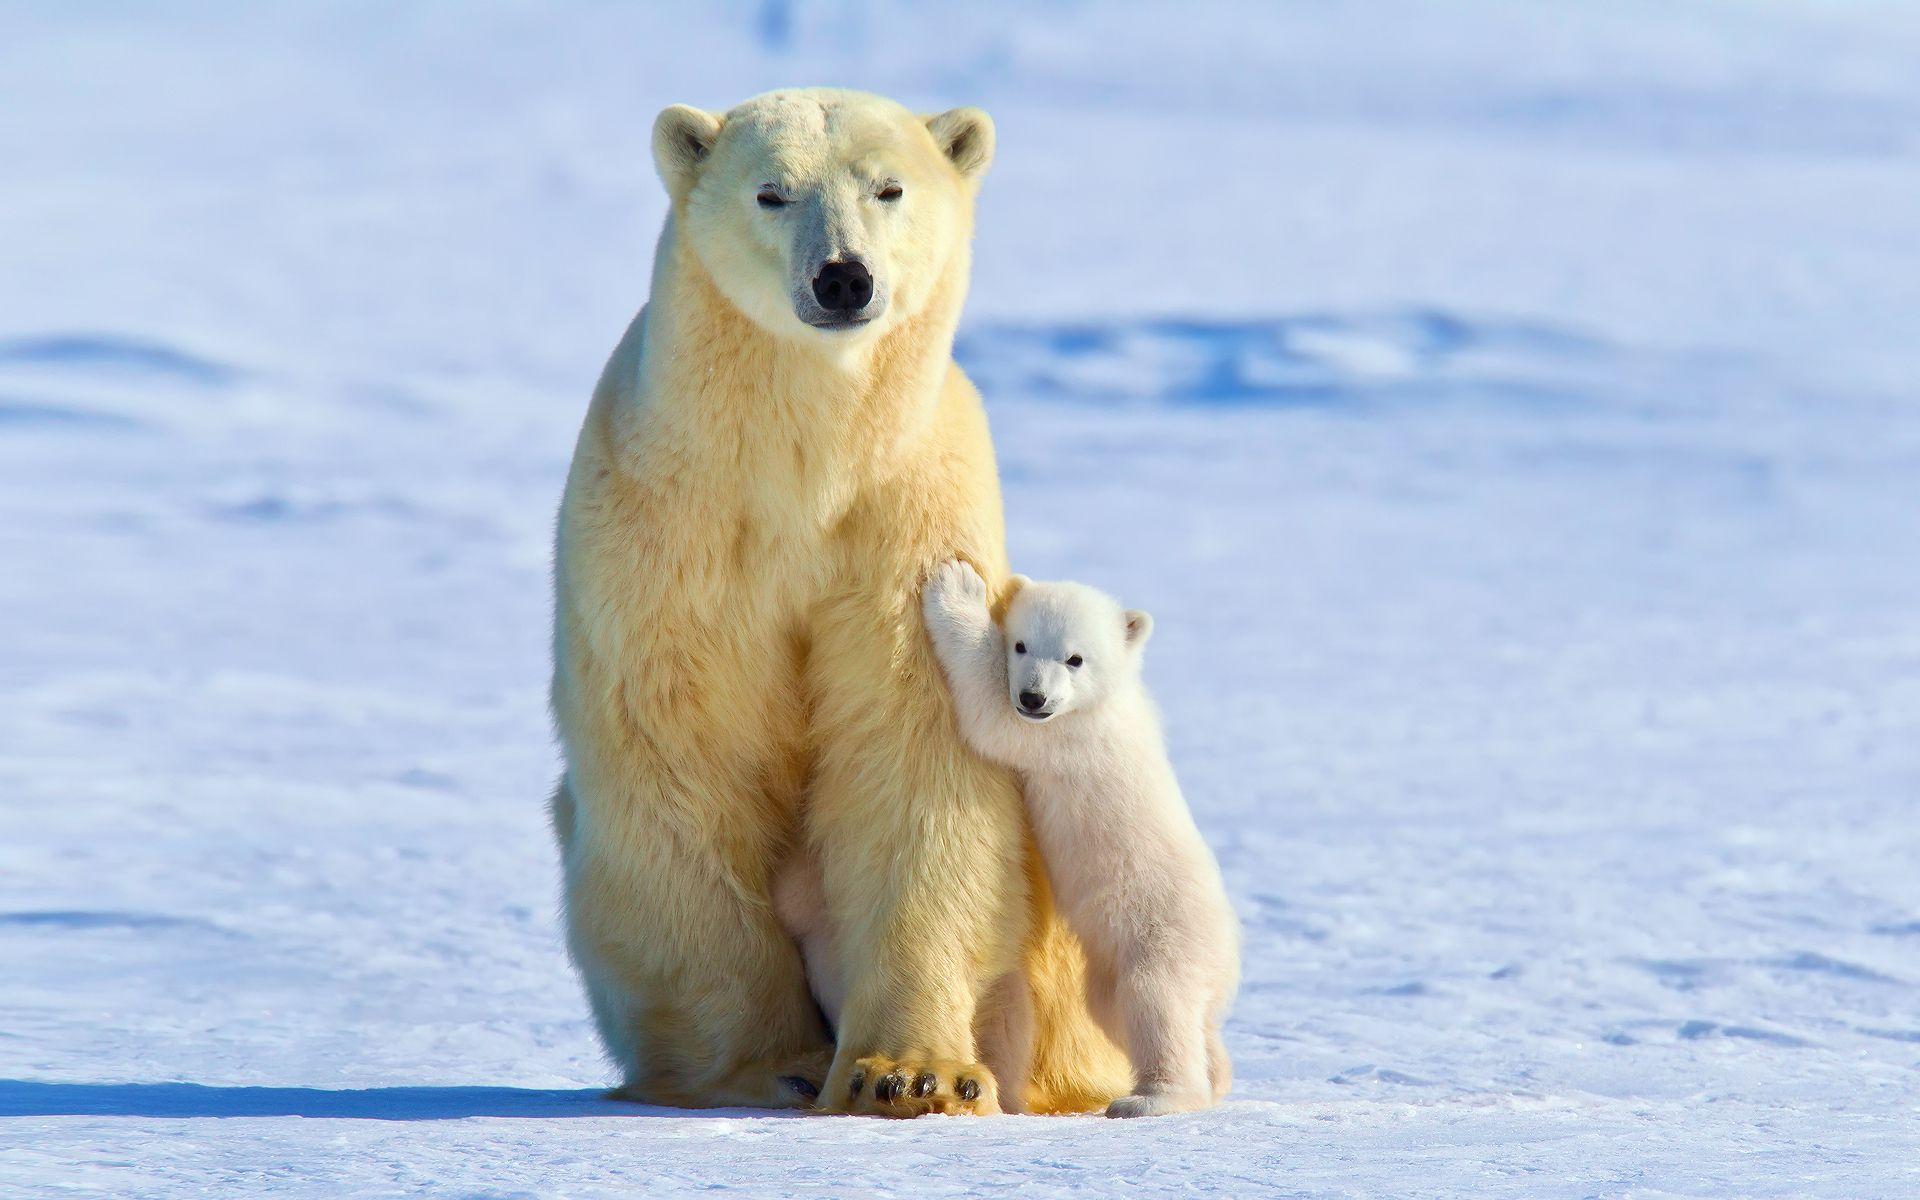 Baby Polar Bears Wallpapers For Desktop Polar Bears Animals Snow Ice Baby Animals Wallpapers Hd Deskto Baby Polar Bears Polar Bear Wallpaper Polar Bear